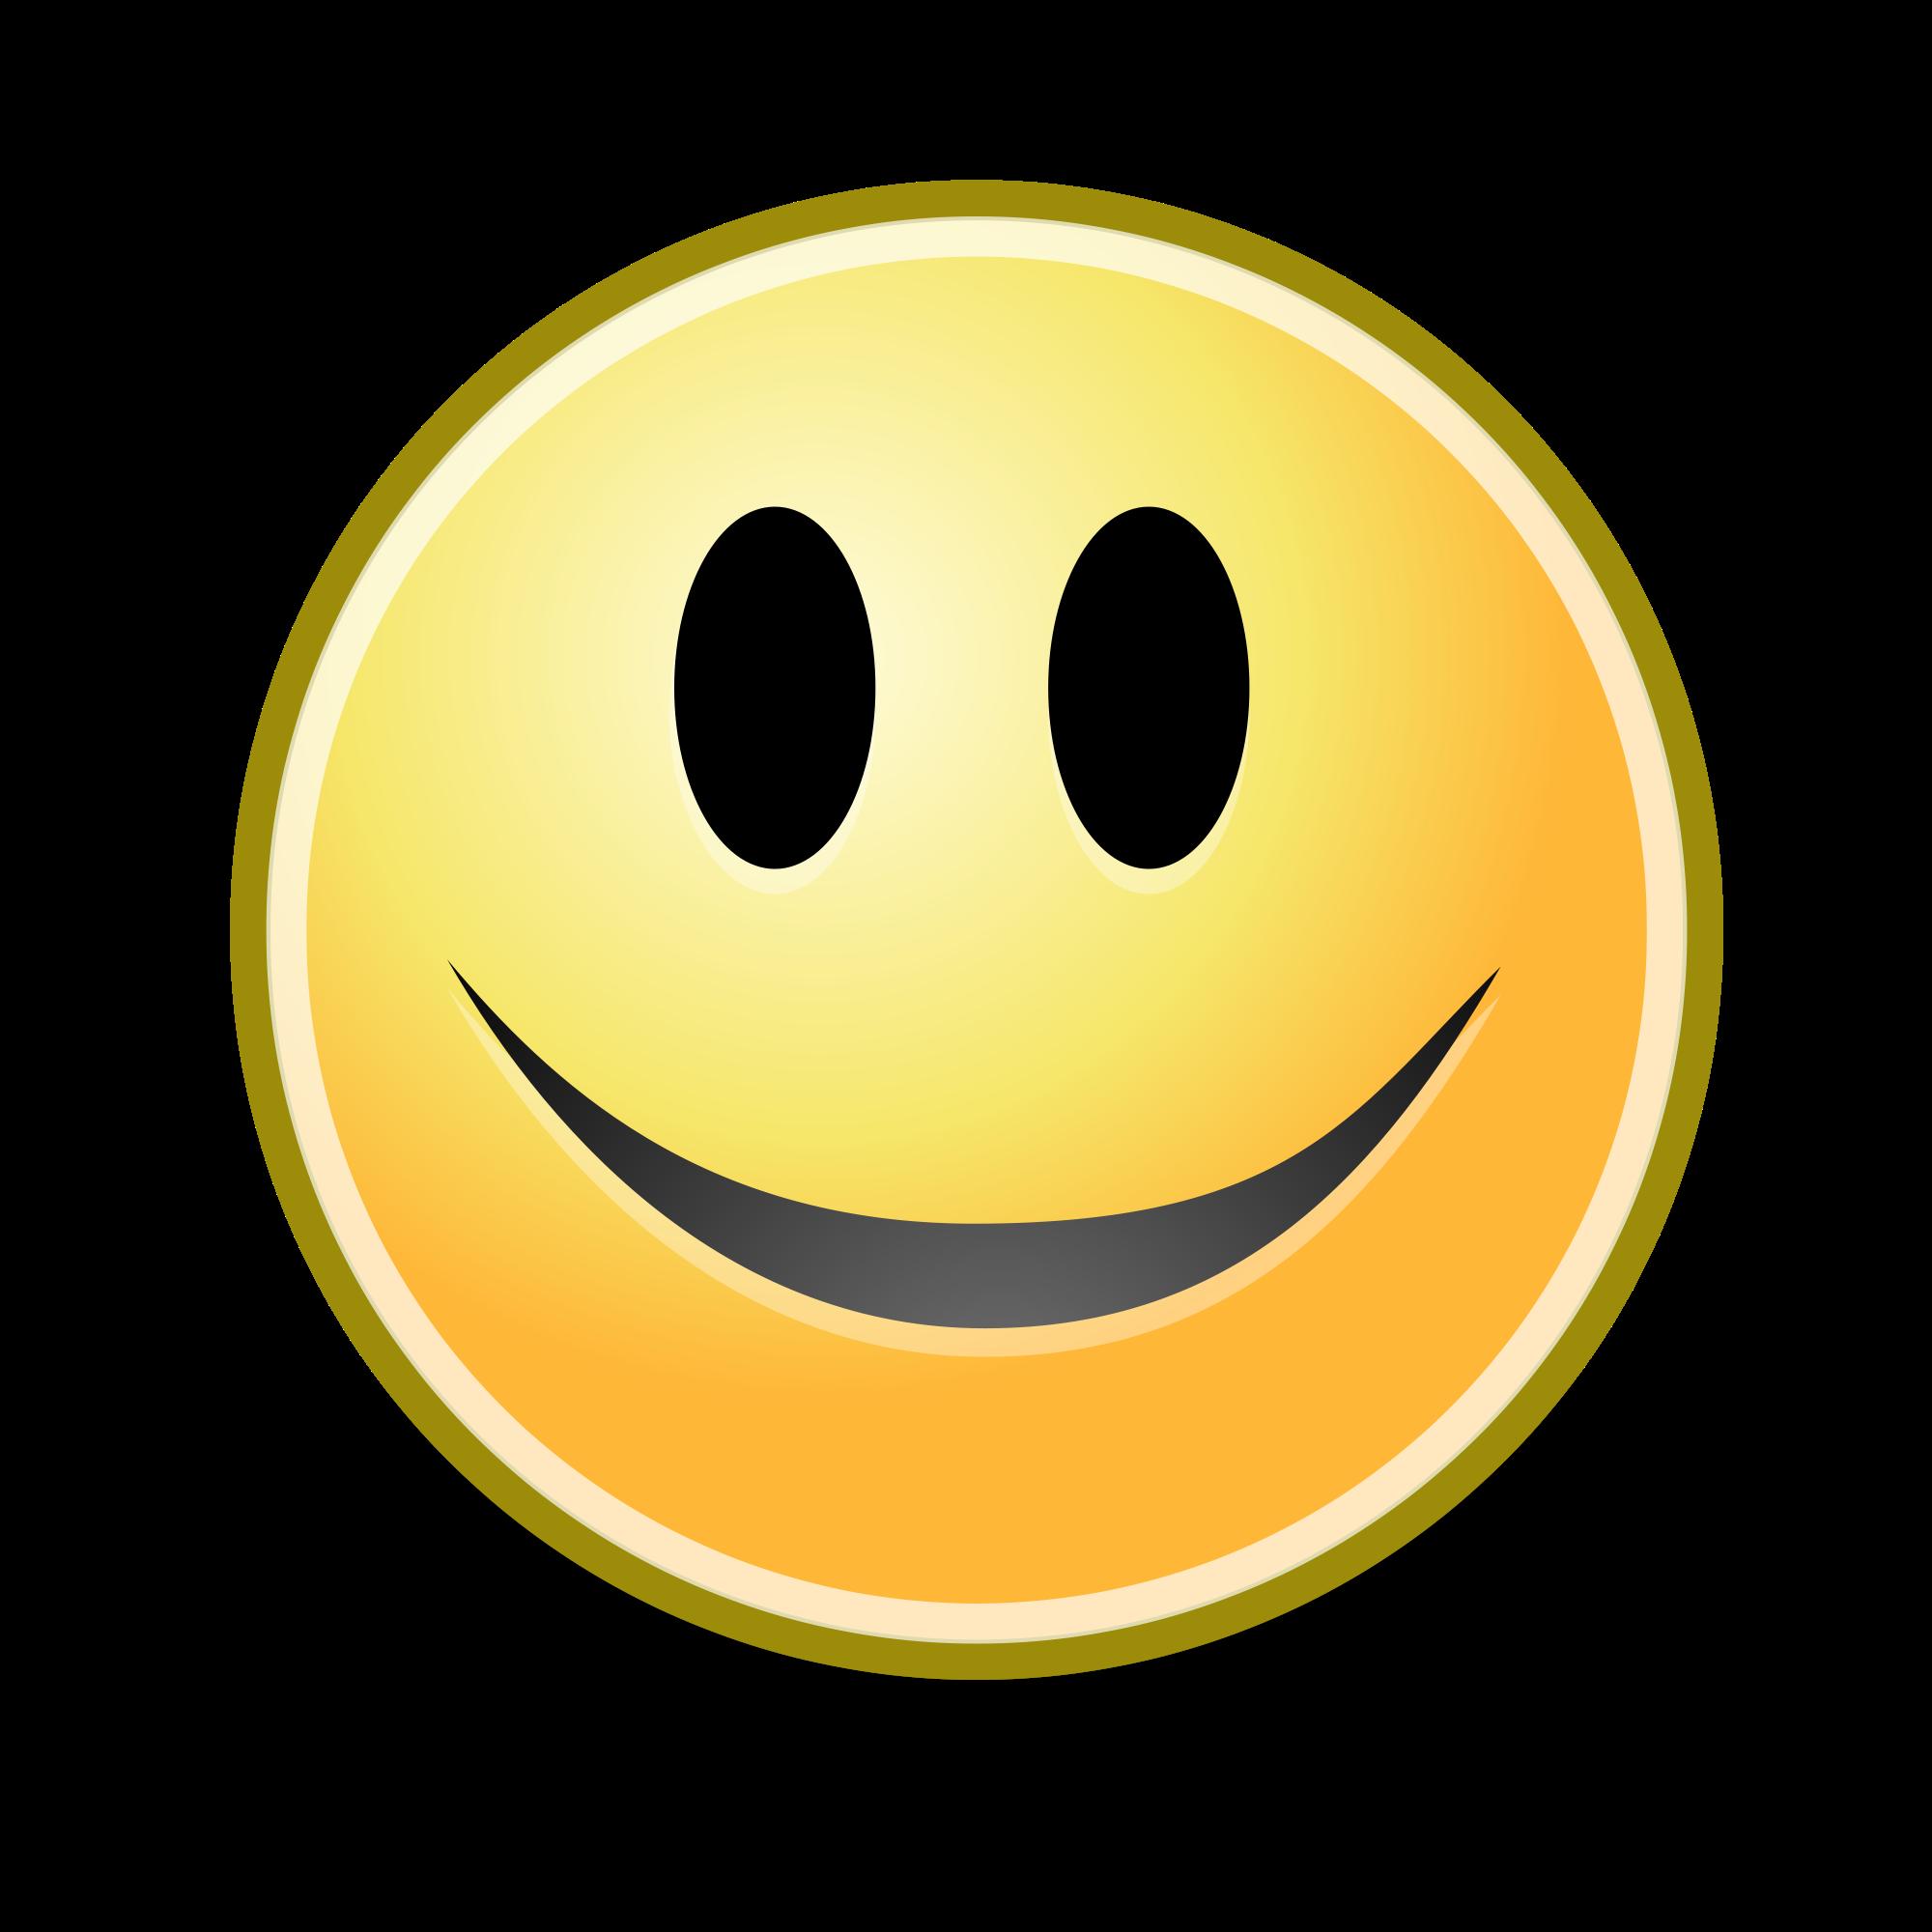 Smile Png & Free Smile.png Transparent Images #1888.